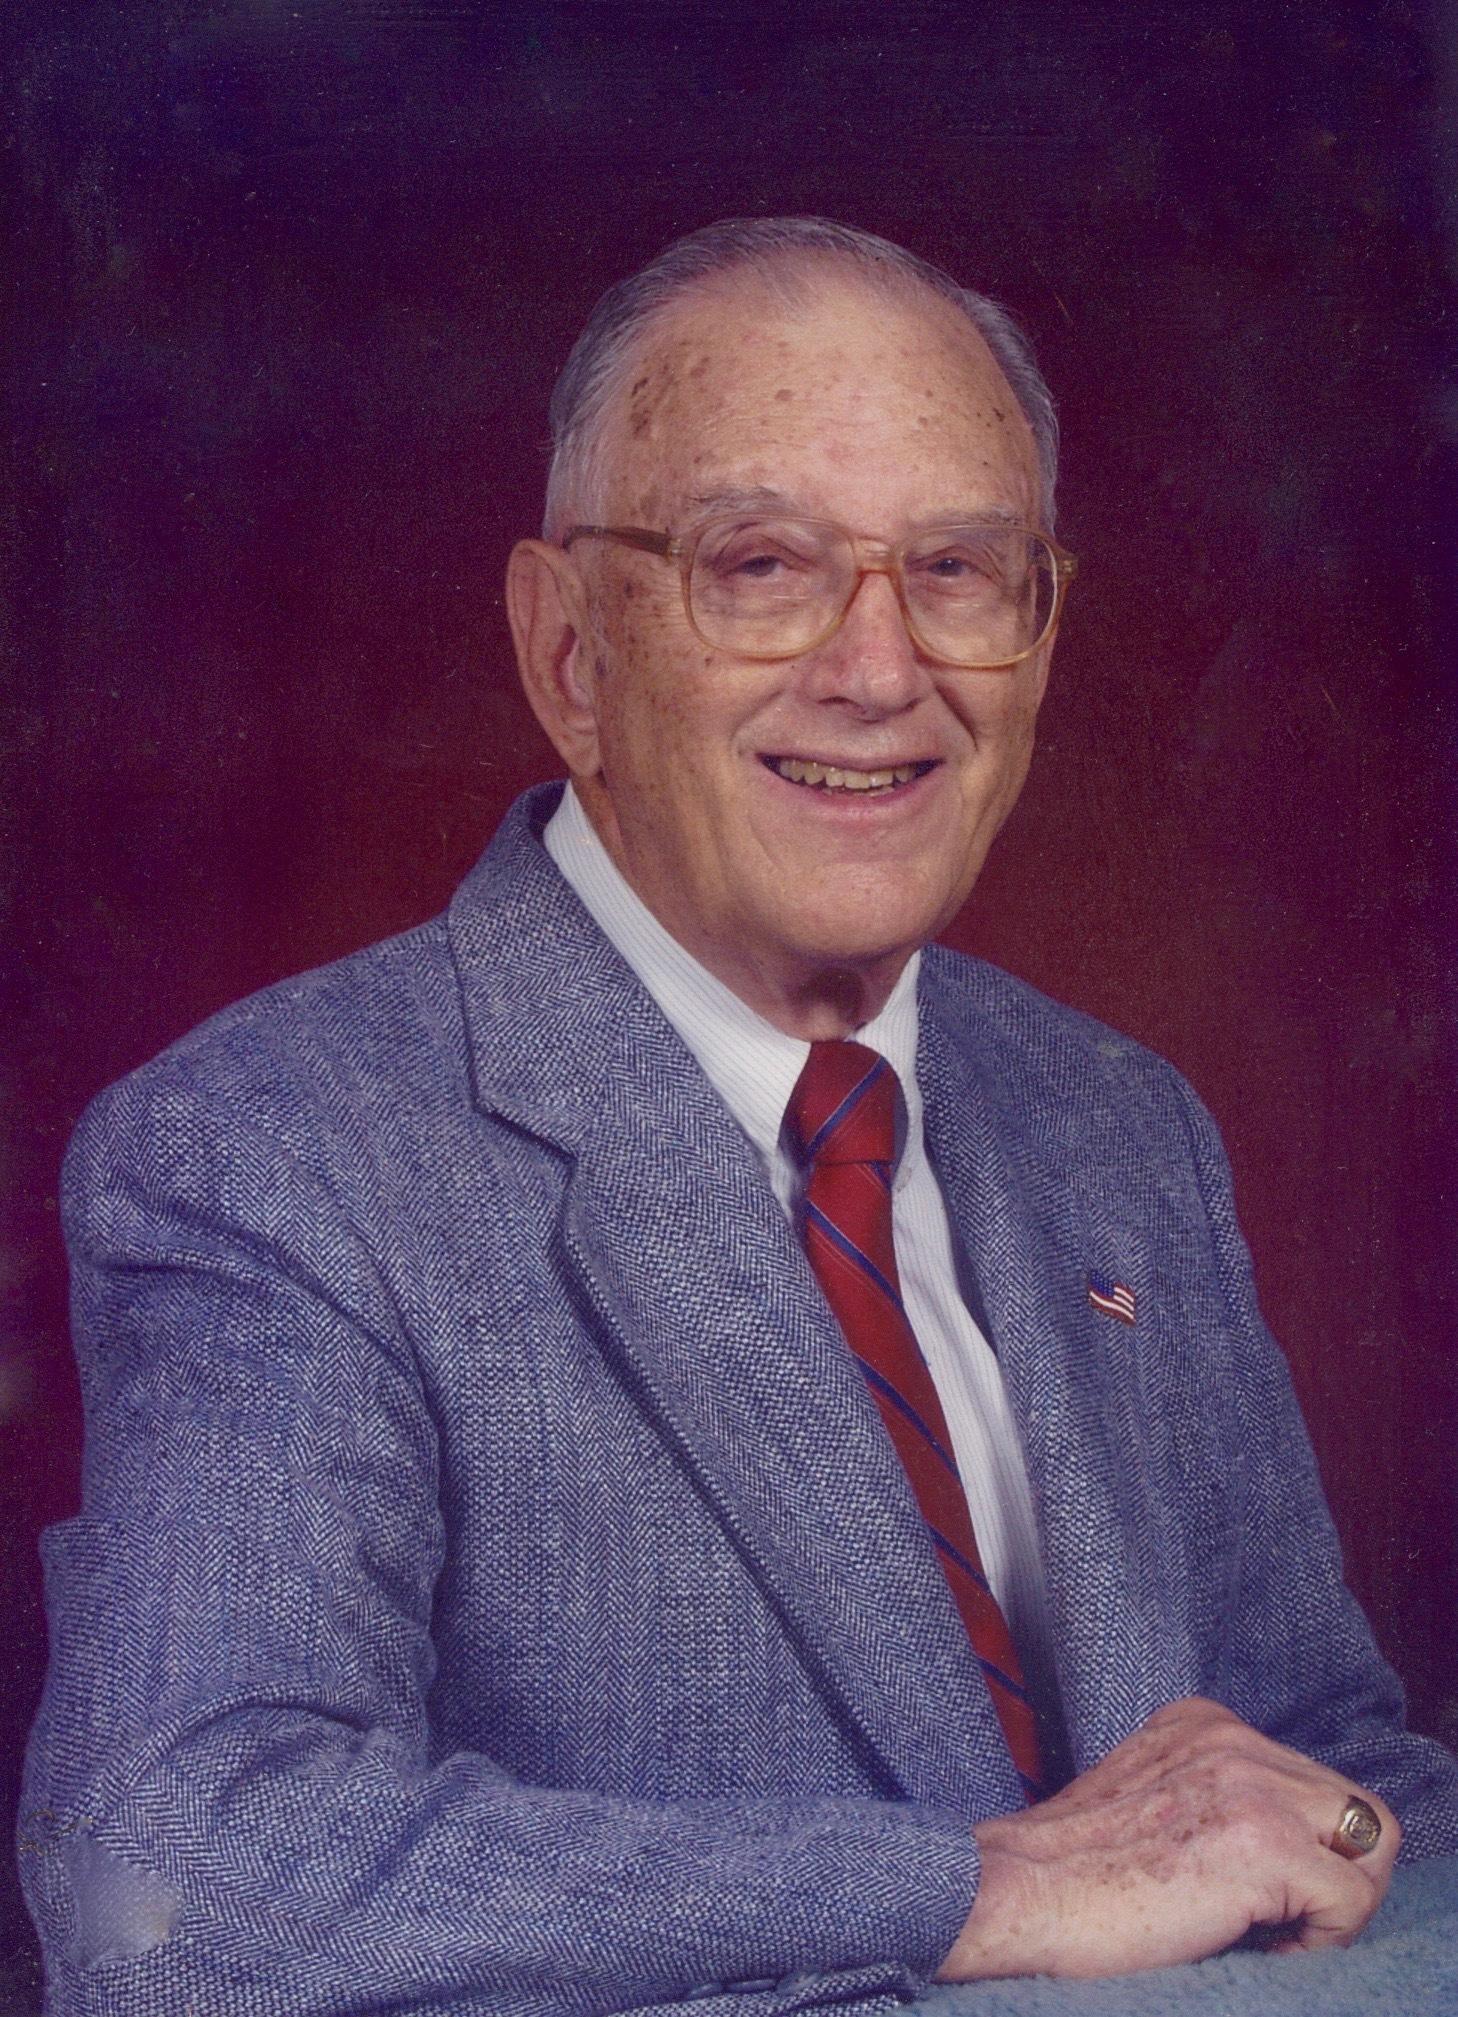 Algernon Sidney Badger